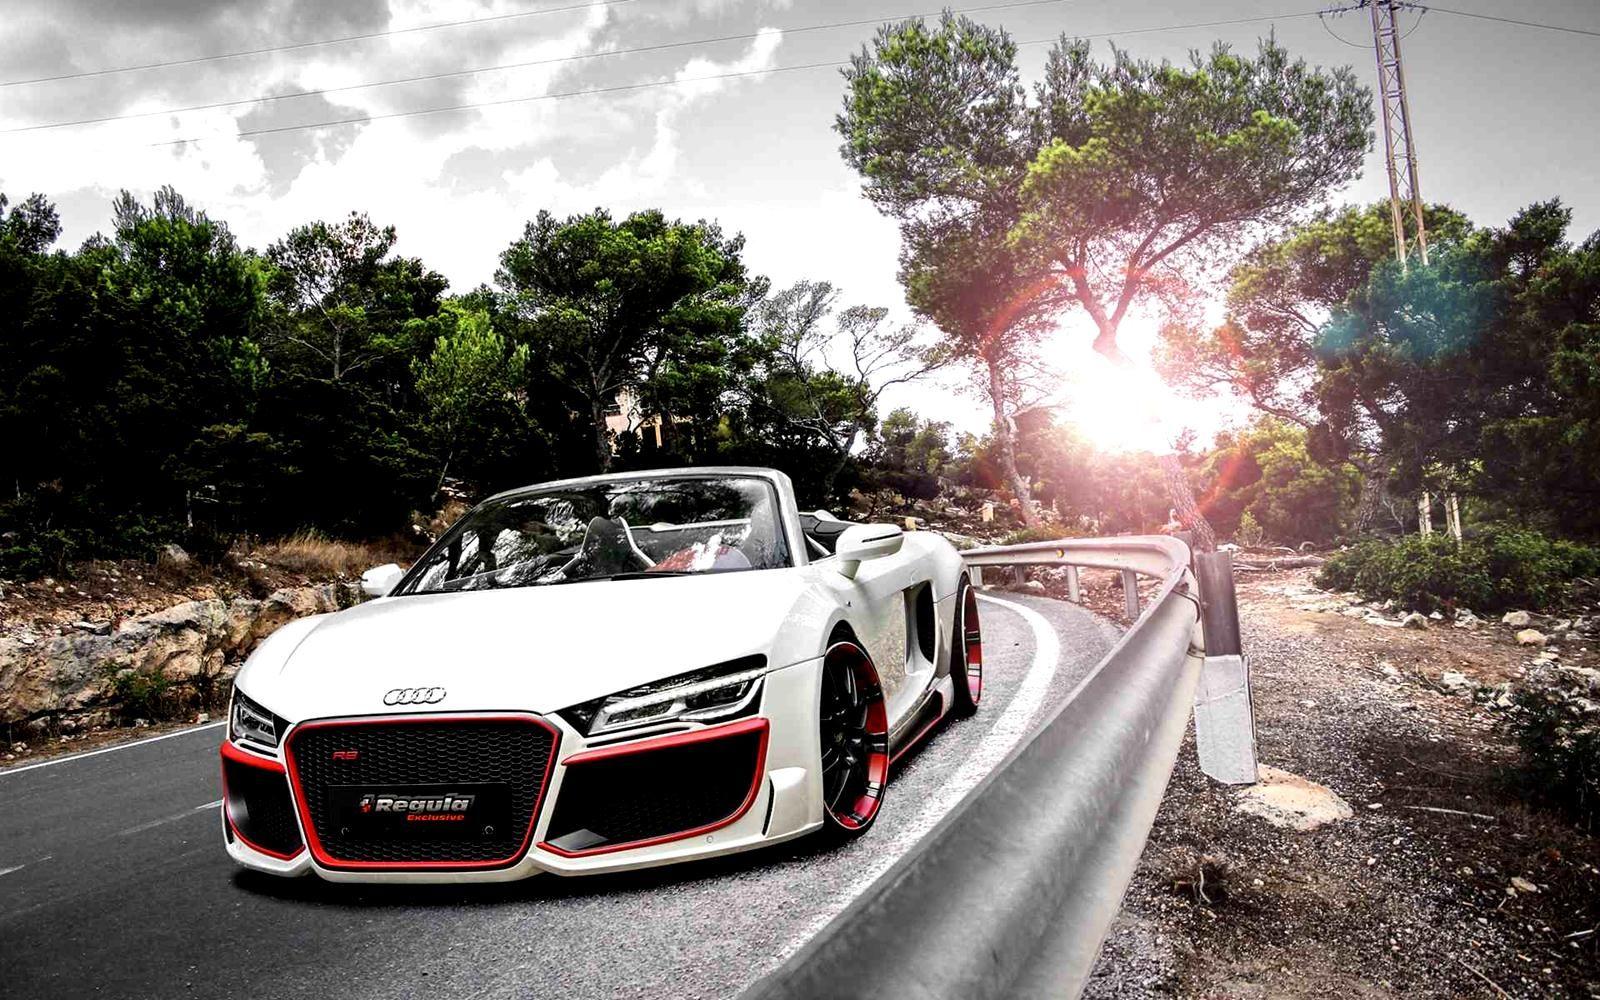 2014 Audi R8 V10 Spyder Regula Tuning Cool Car Wallpapers Audi Cars Audi R8 V10 Audi R8